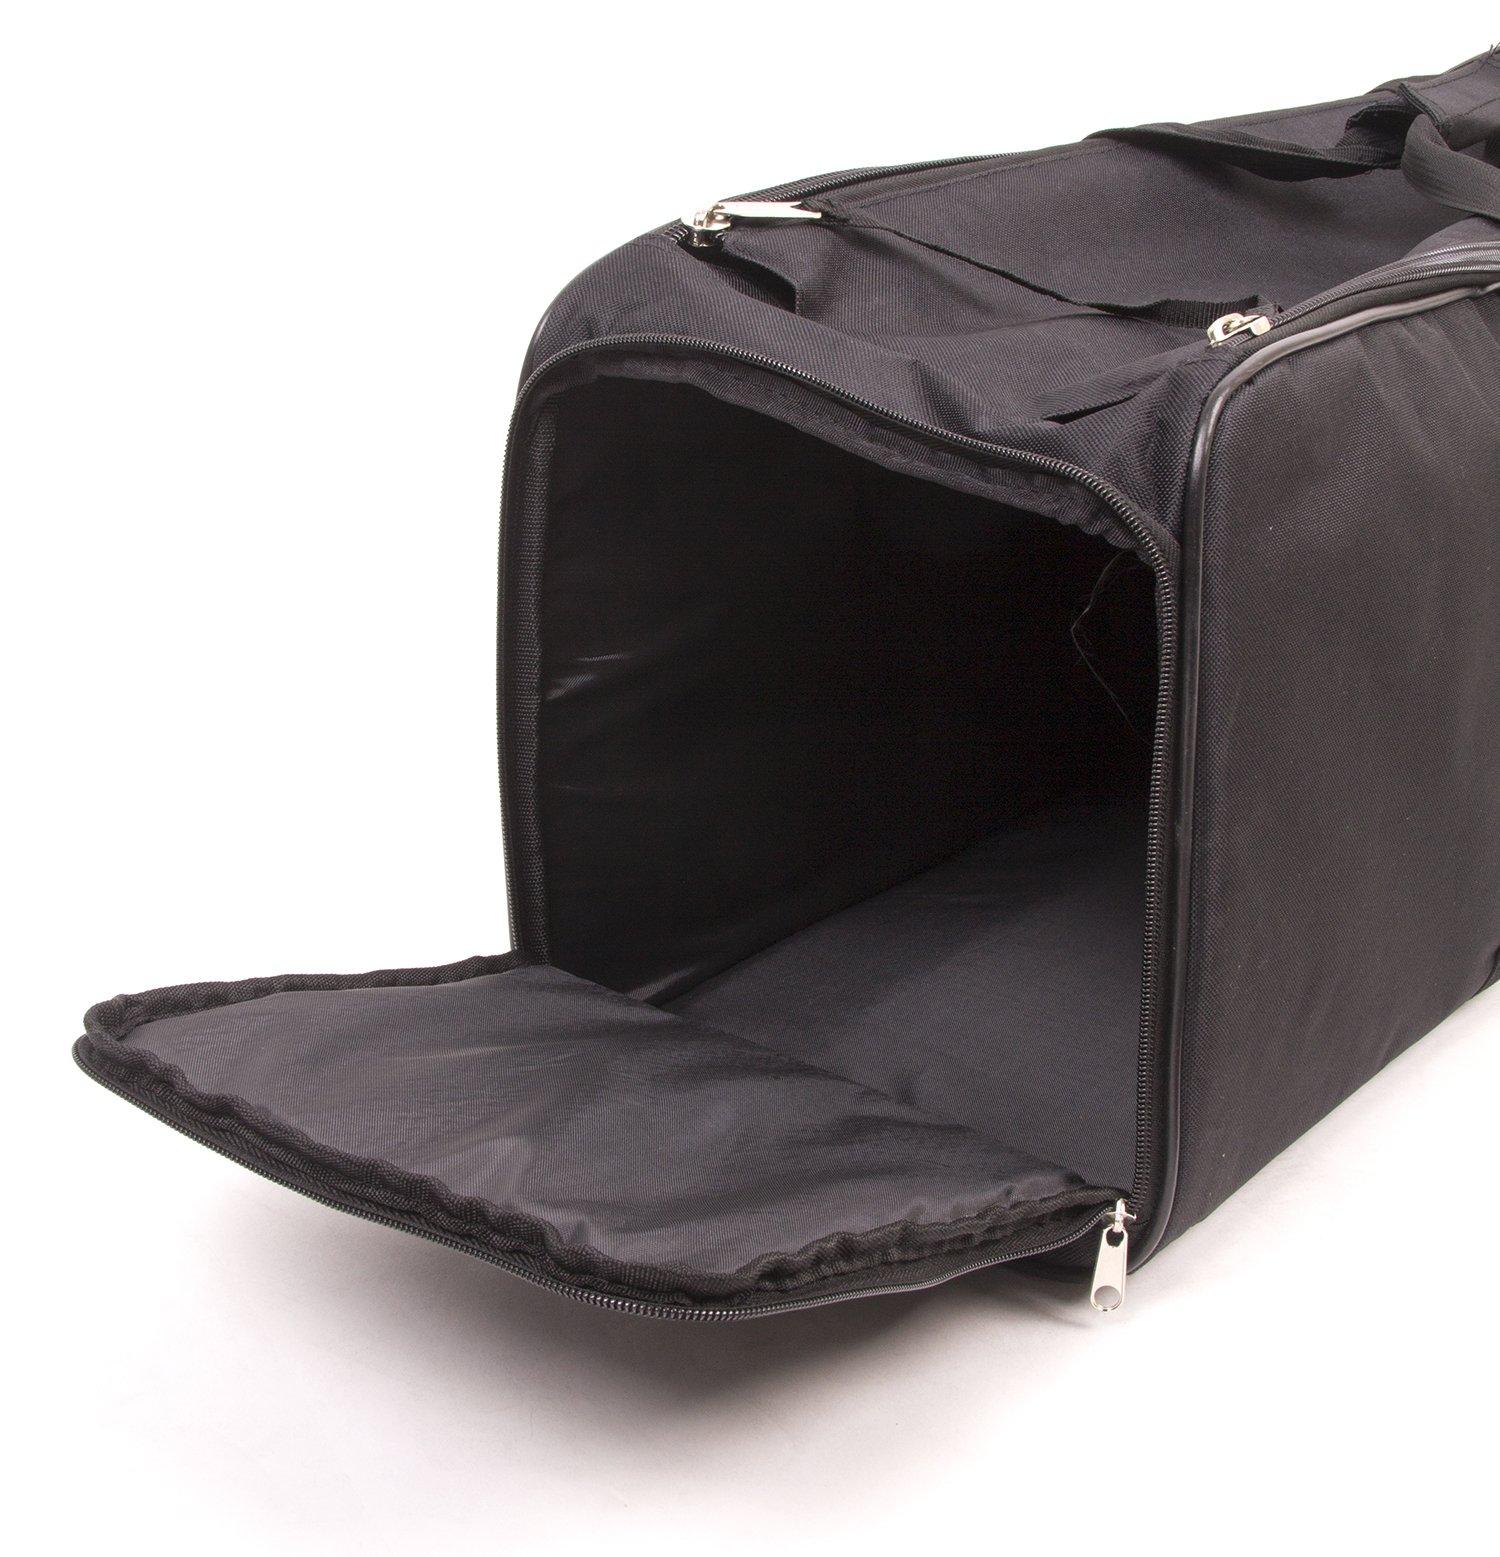 Fovitec - 1x Classic Photography & Video Lighting Equipment Duffle Bag - [35'' x 9'' x 9''][Lightweight][Durable Nylon][Dual Zippers] by Fovitec (Image #3)